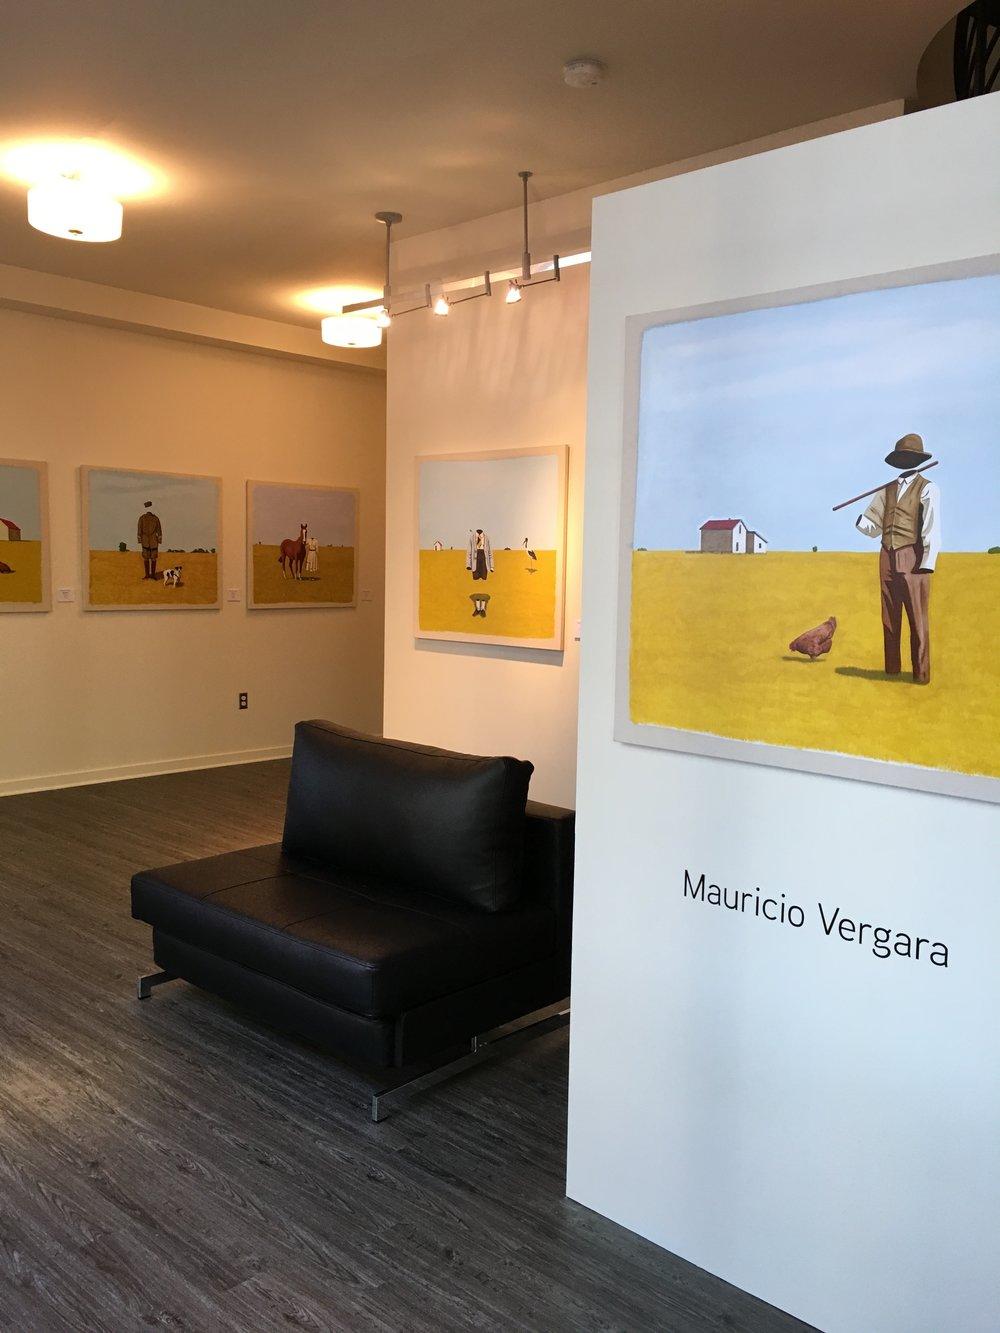 Mauricio Vergara Solo Exhibition and Seattle location Inaugural Exhibition April 2017